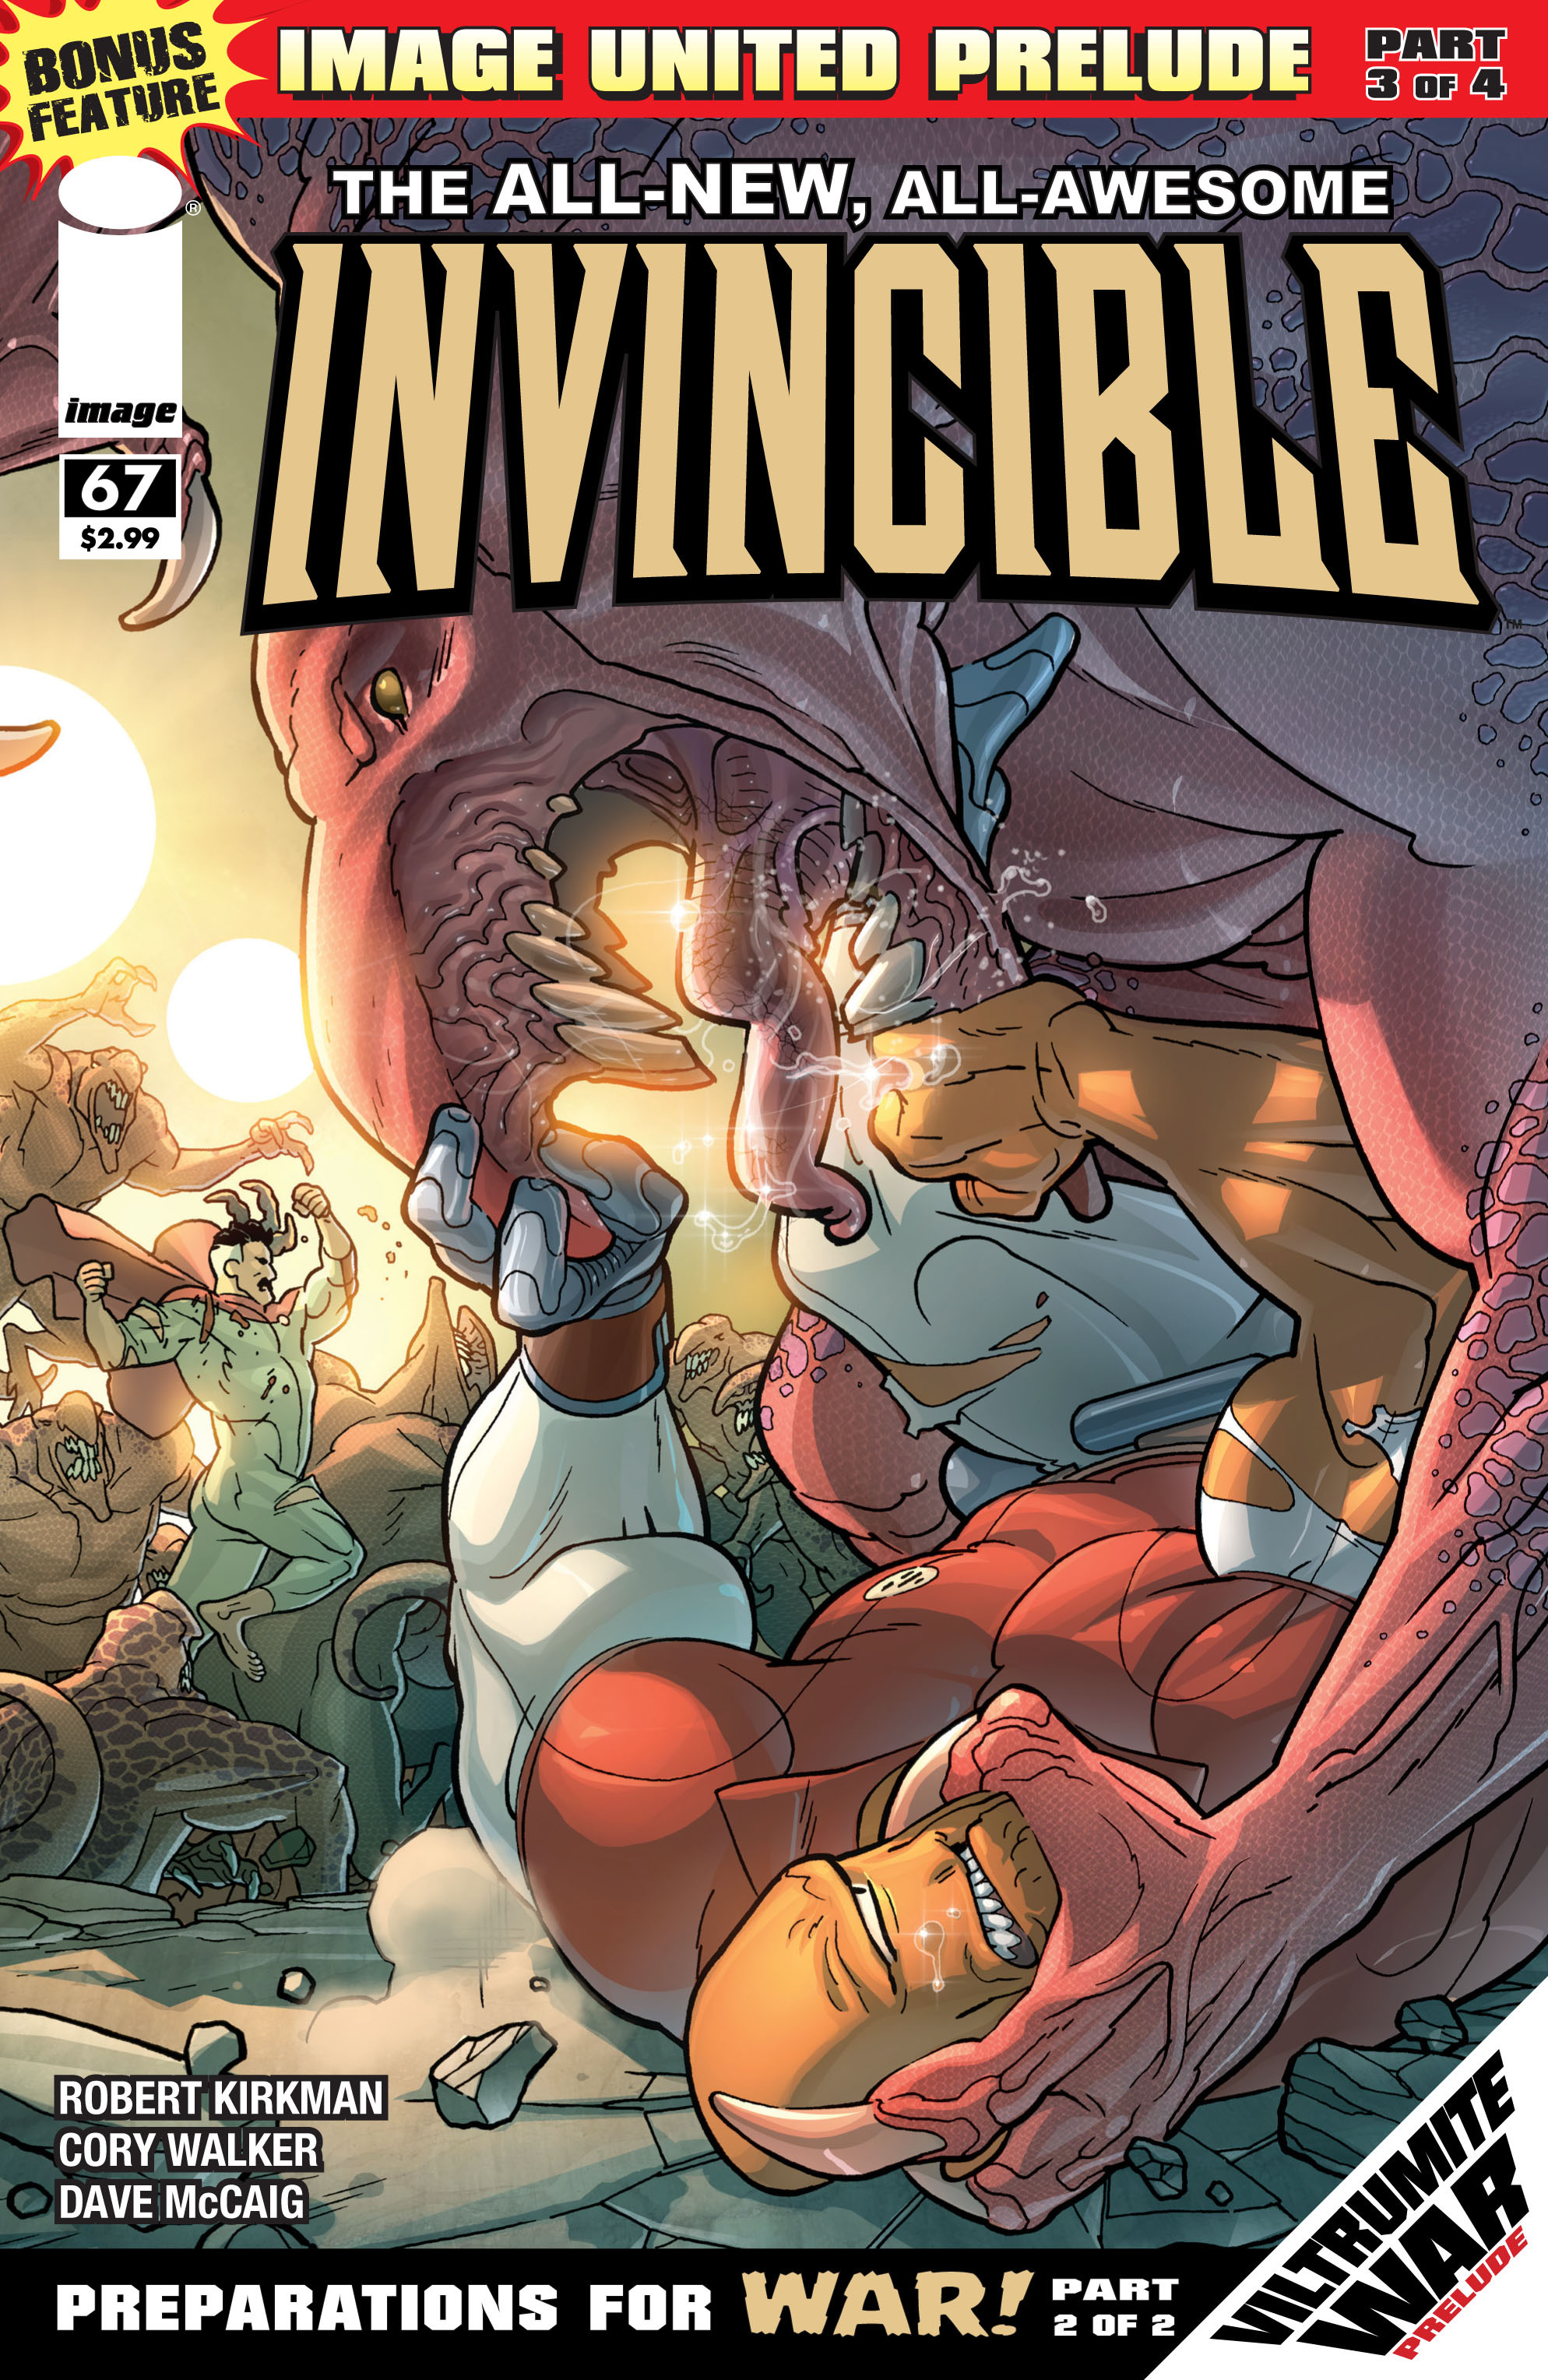 Invincible 67 Page 1